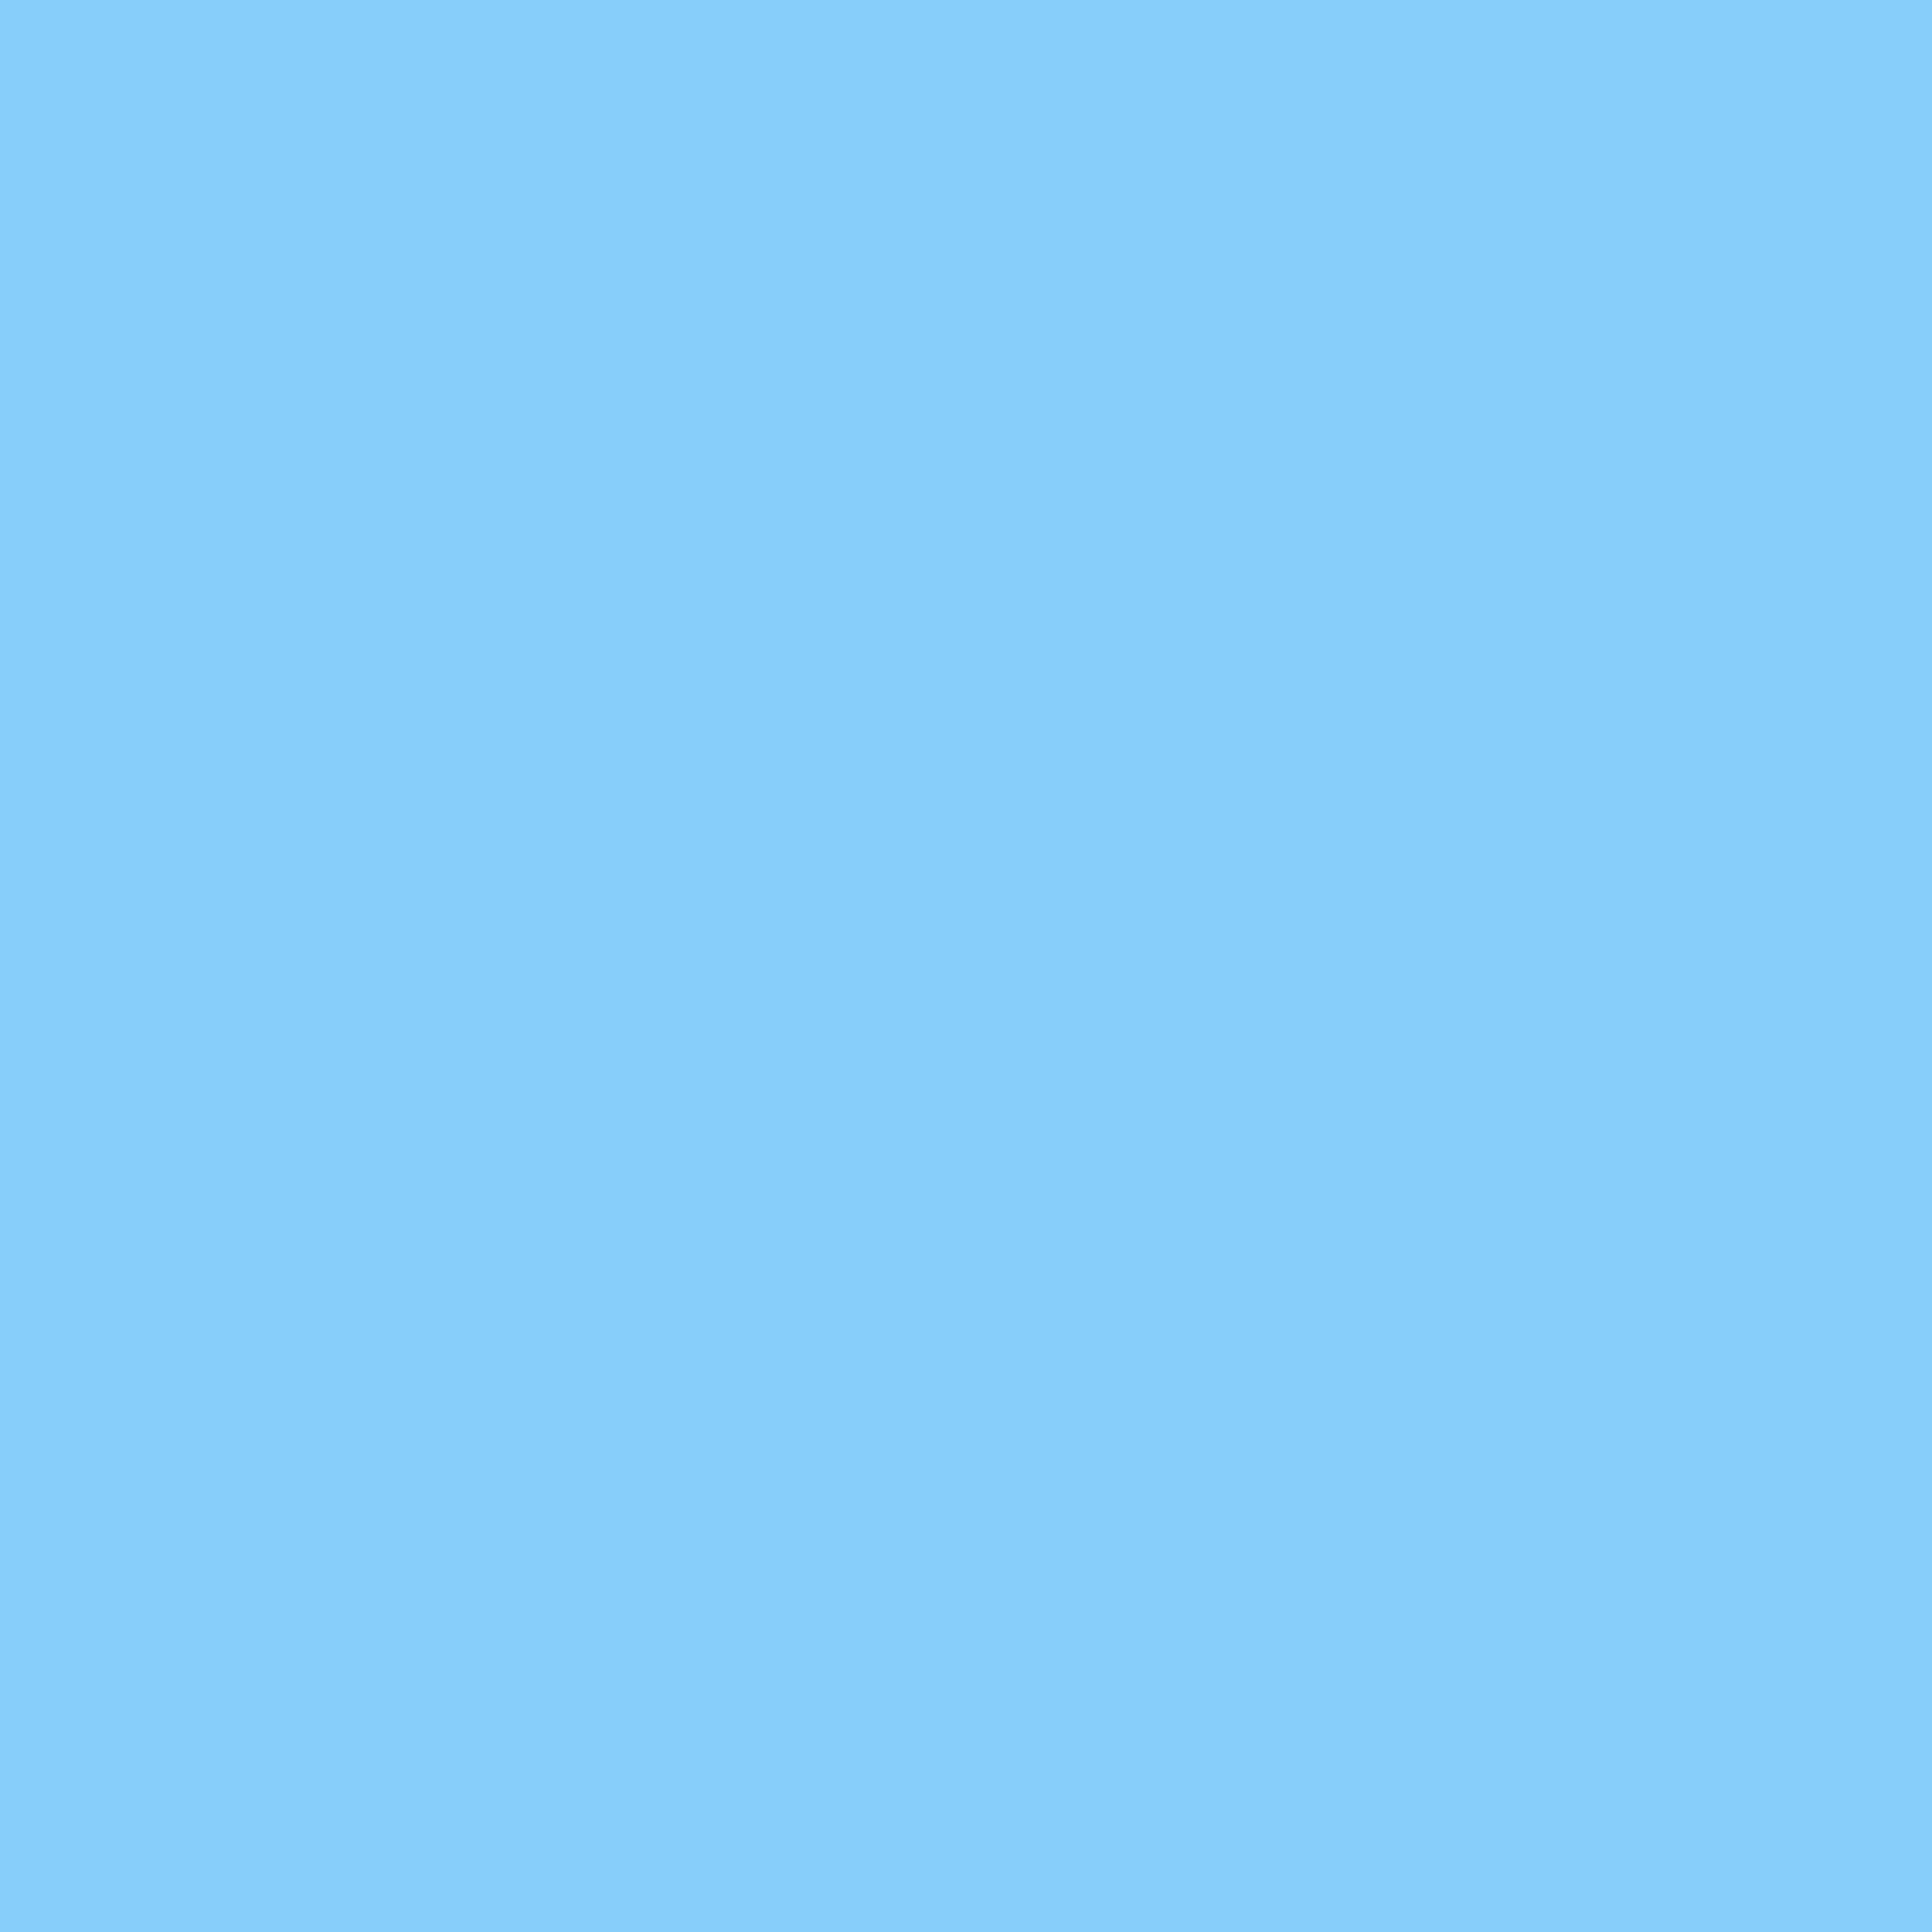 2732x2732 Light Sky Blue Solid Color Background